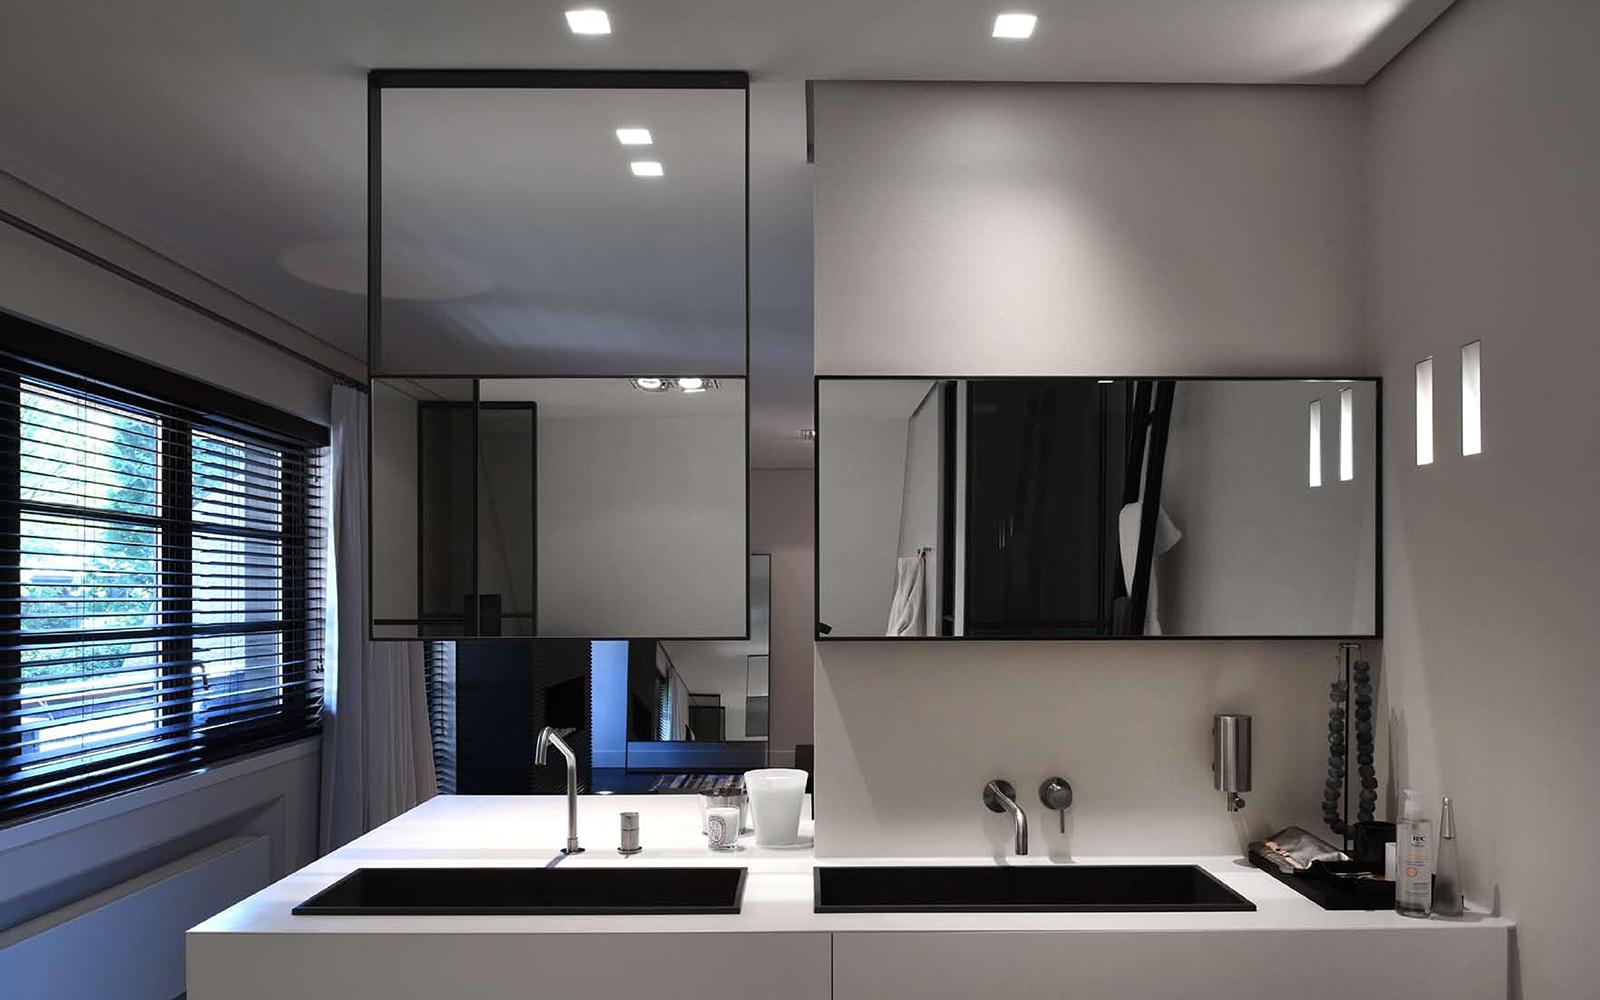 Delektro | Realisatie KNX installatie in prachtige villa | The Art ...